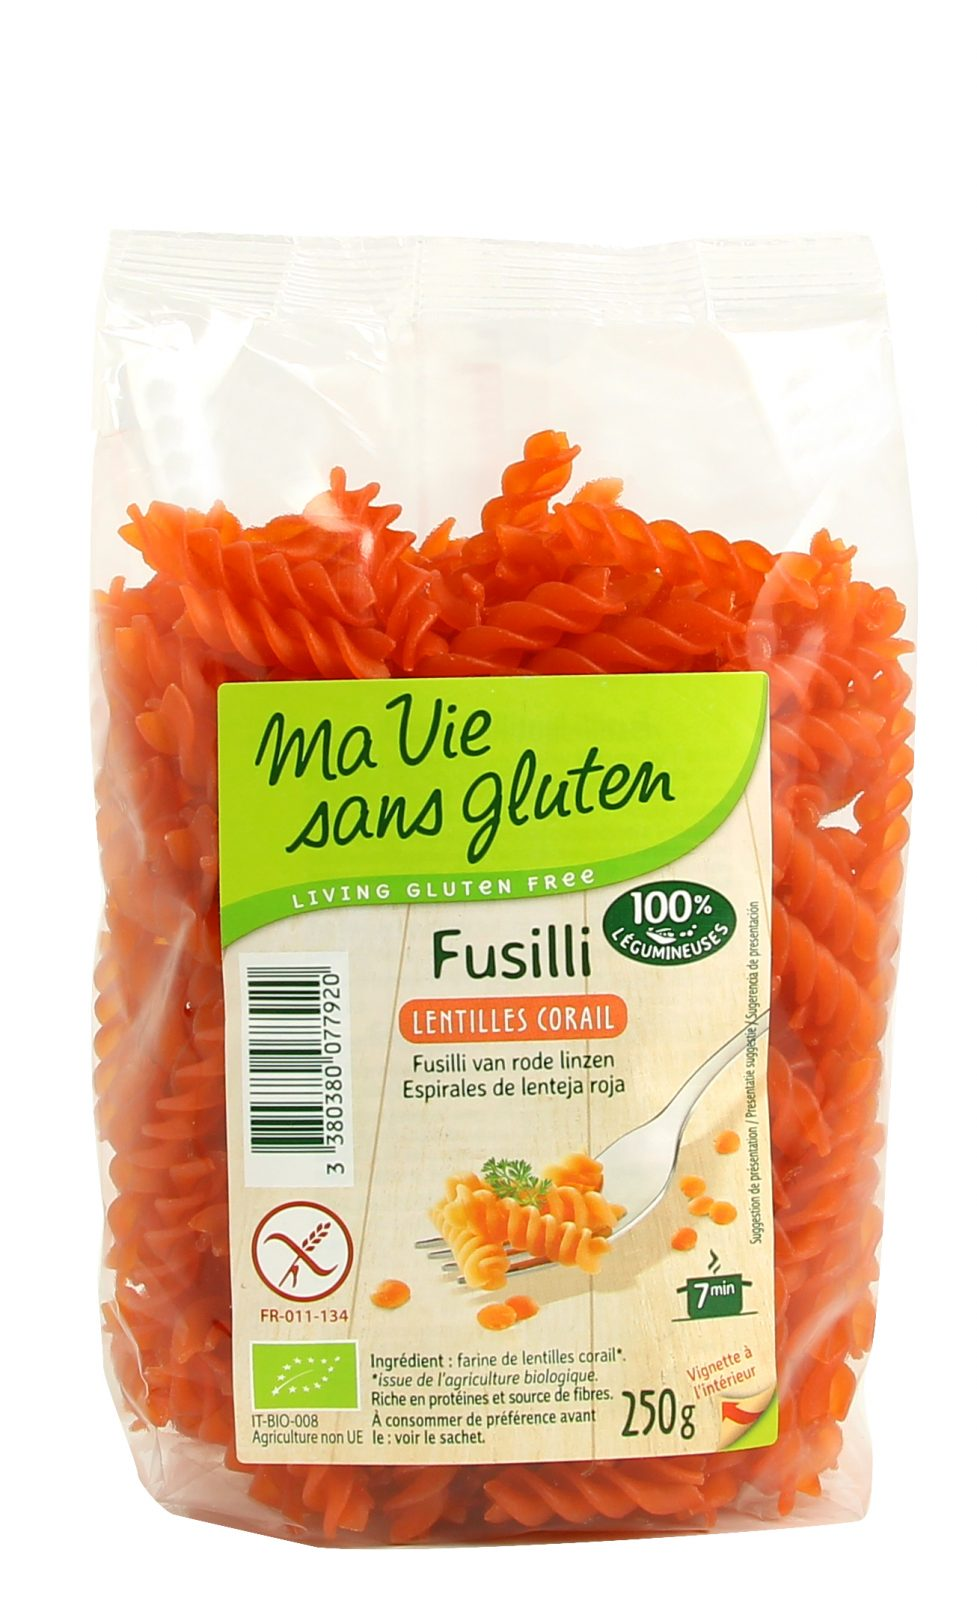 [Ma Vie Sans Gluten] Nui Xoắn Đậu Lăng Đỏ Hữu Cơ 250g